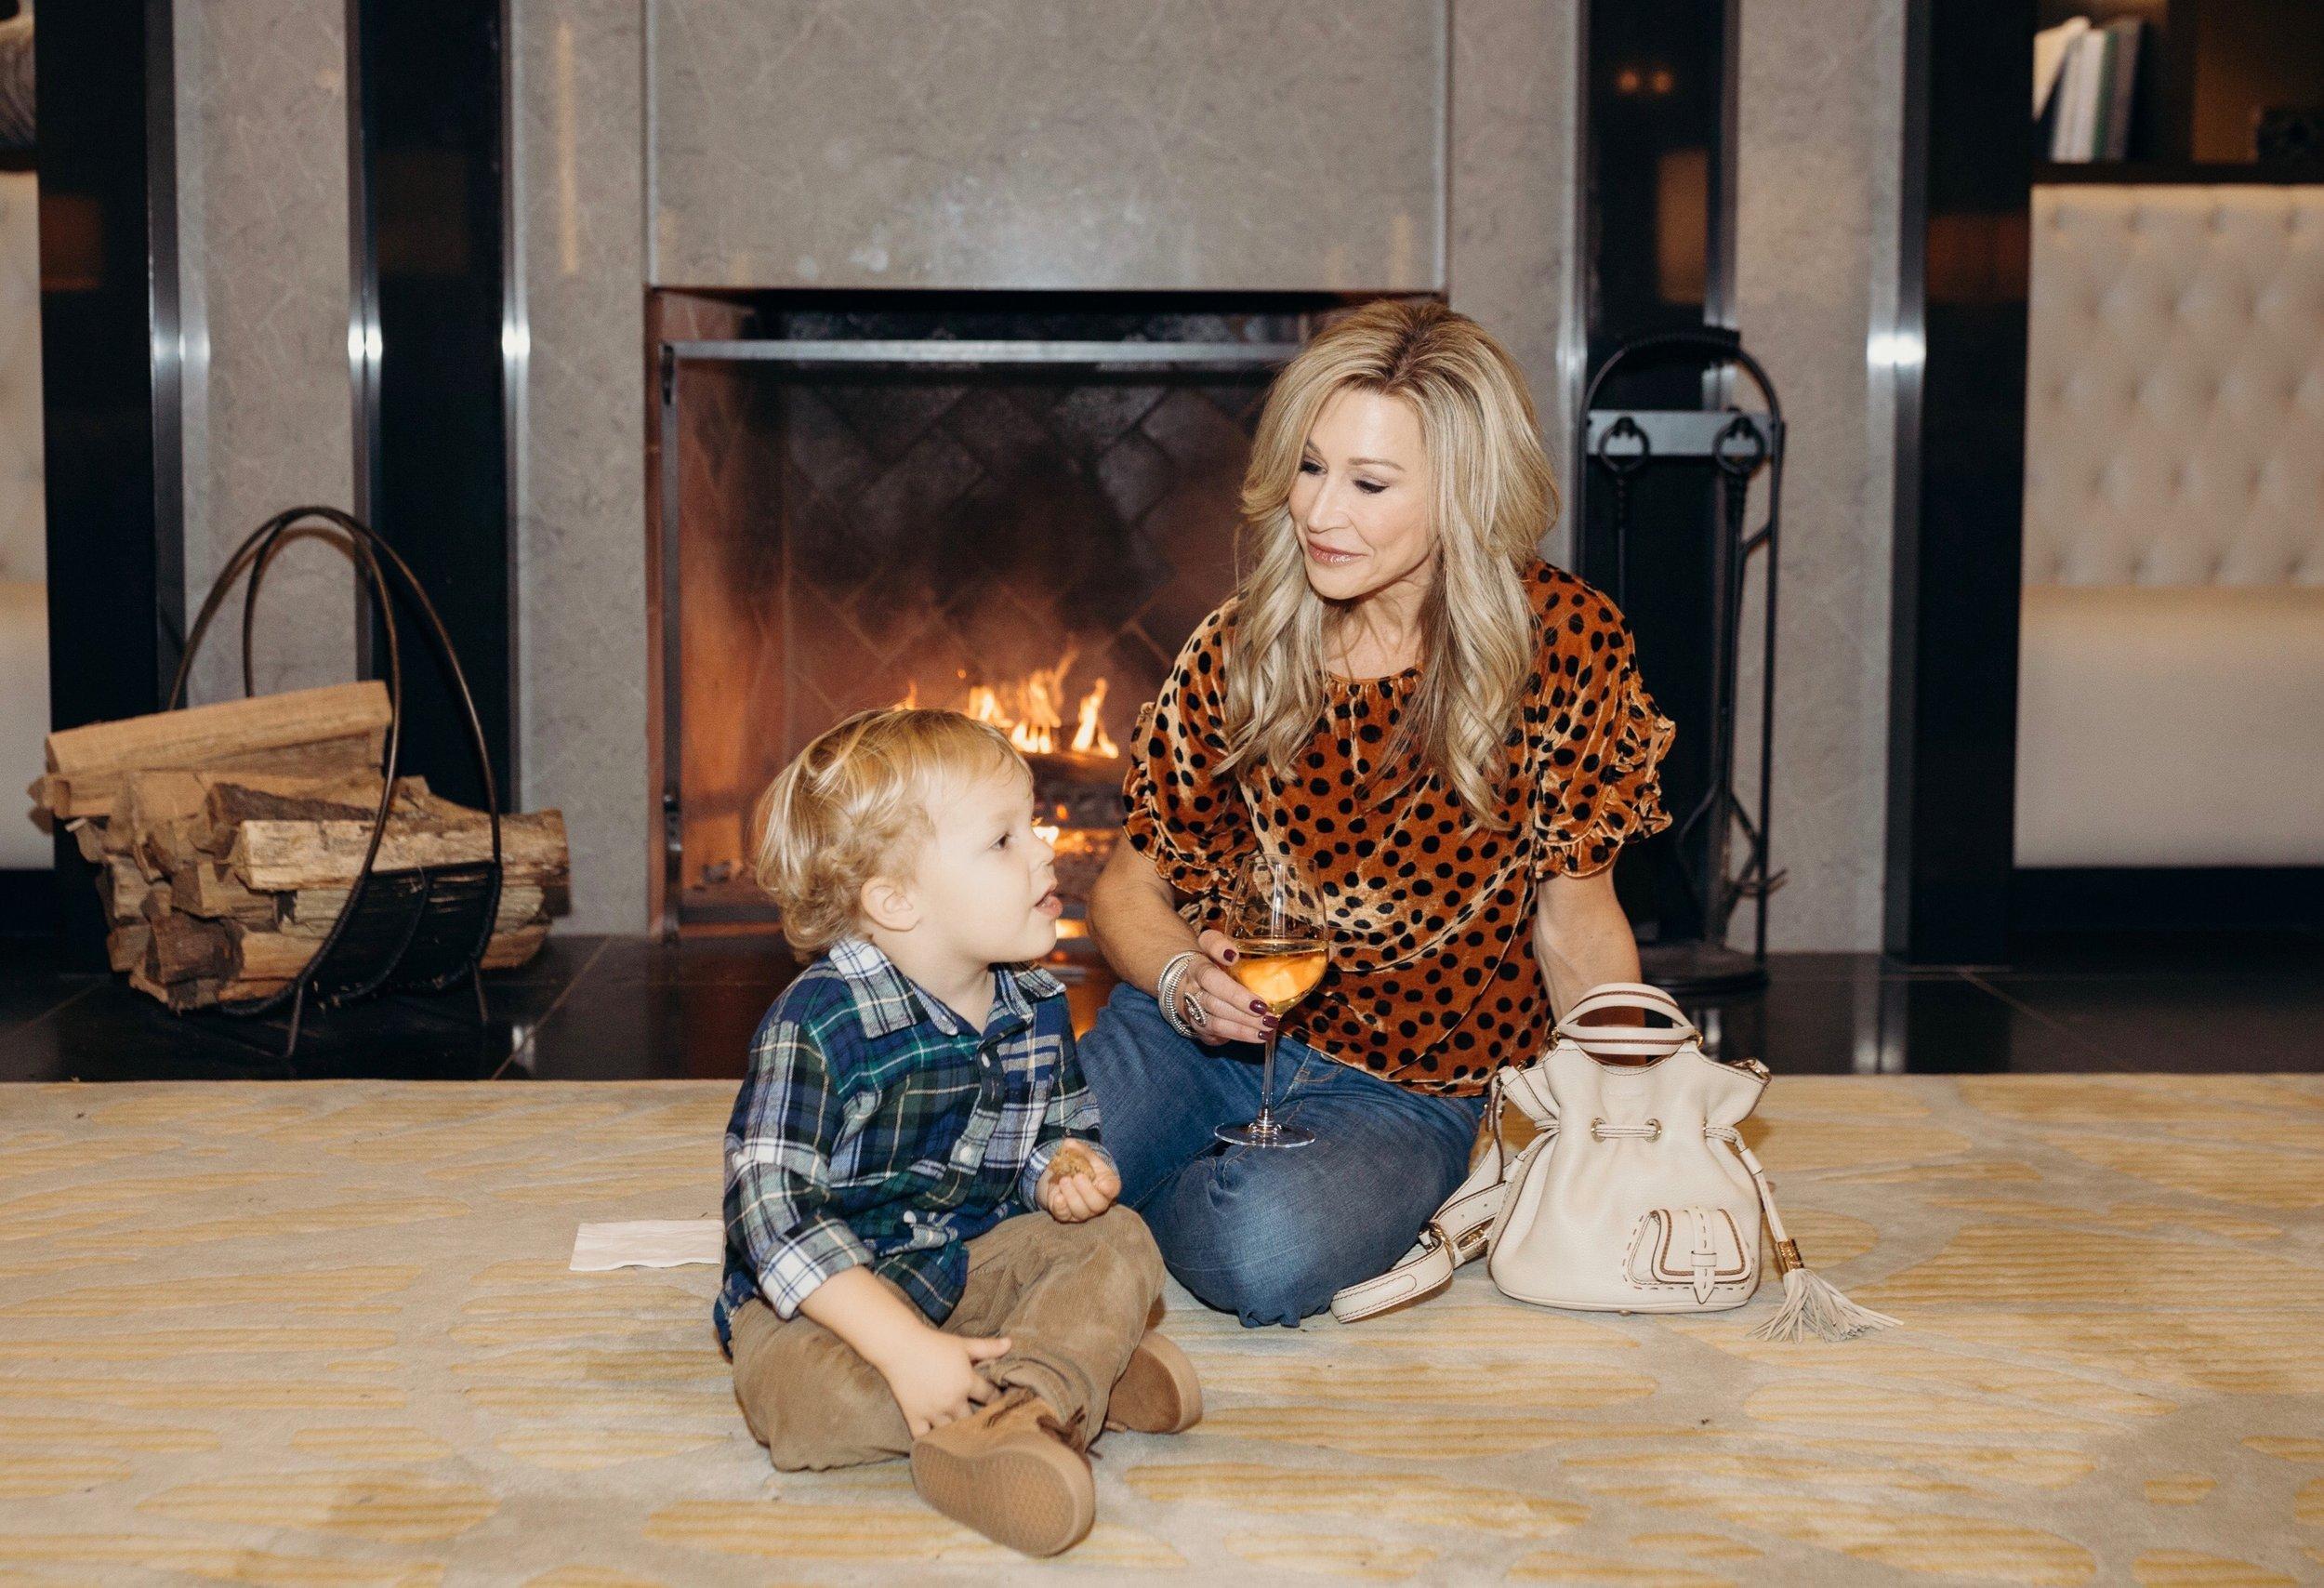 Hudson & Me at The Hotel at Avalon